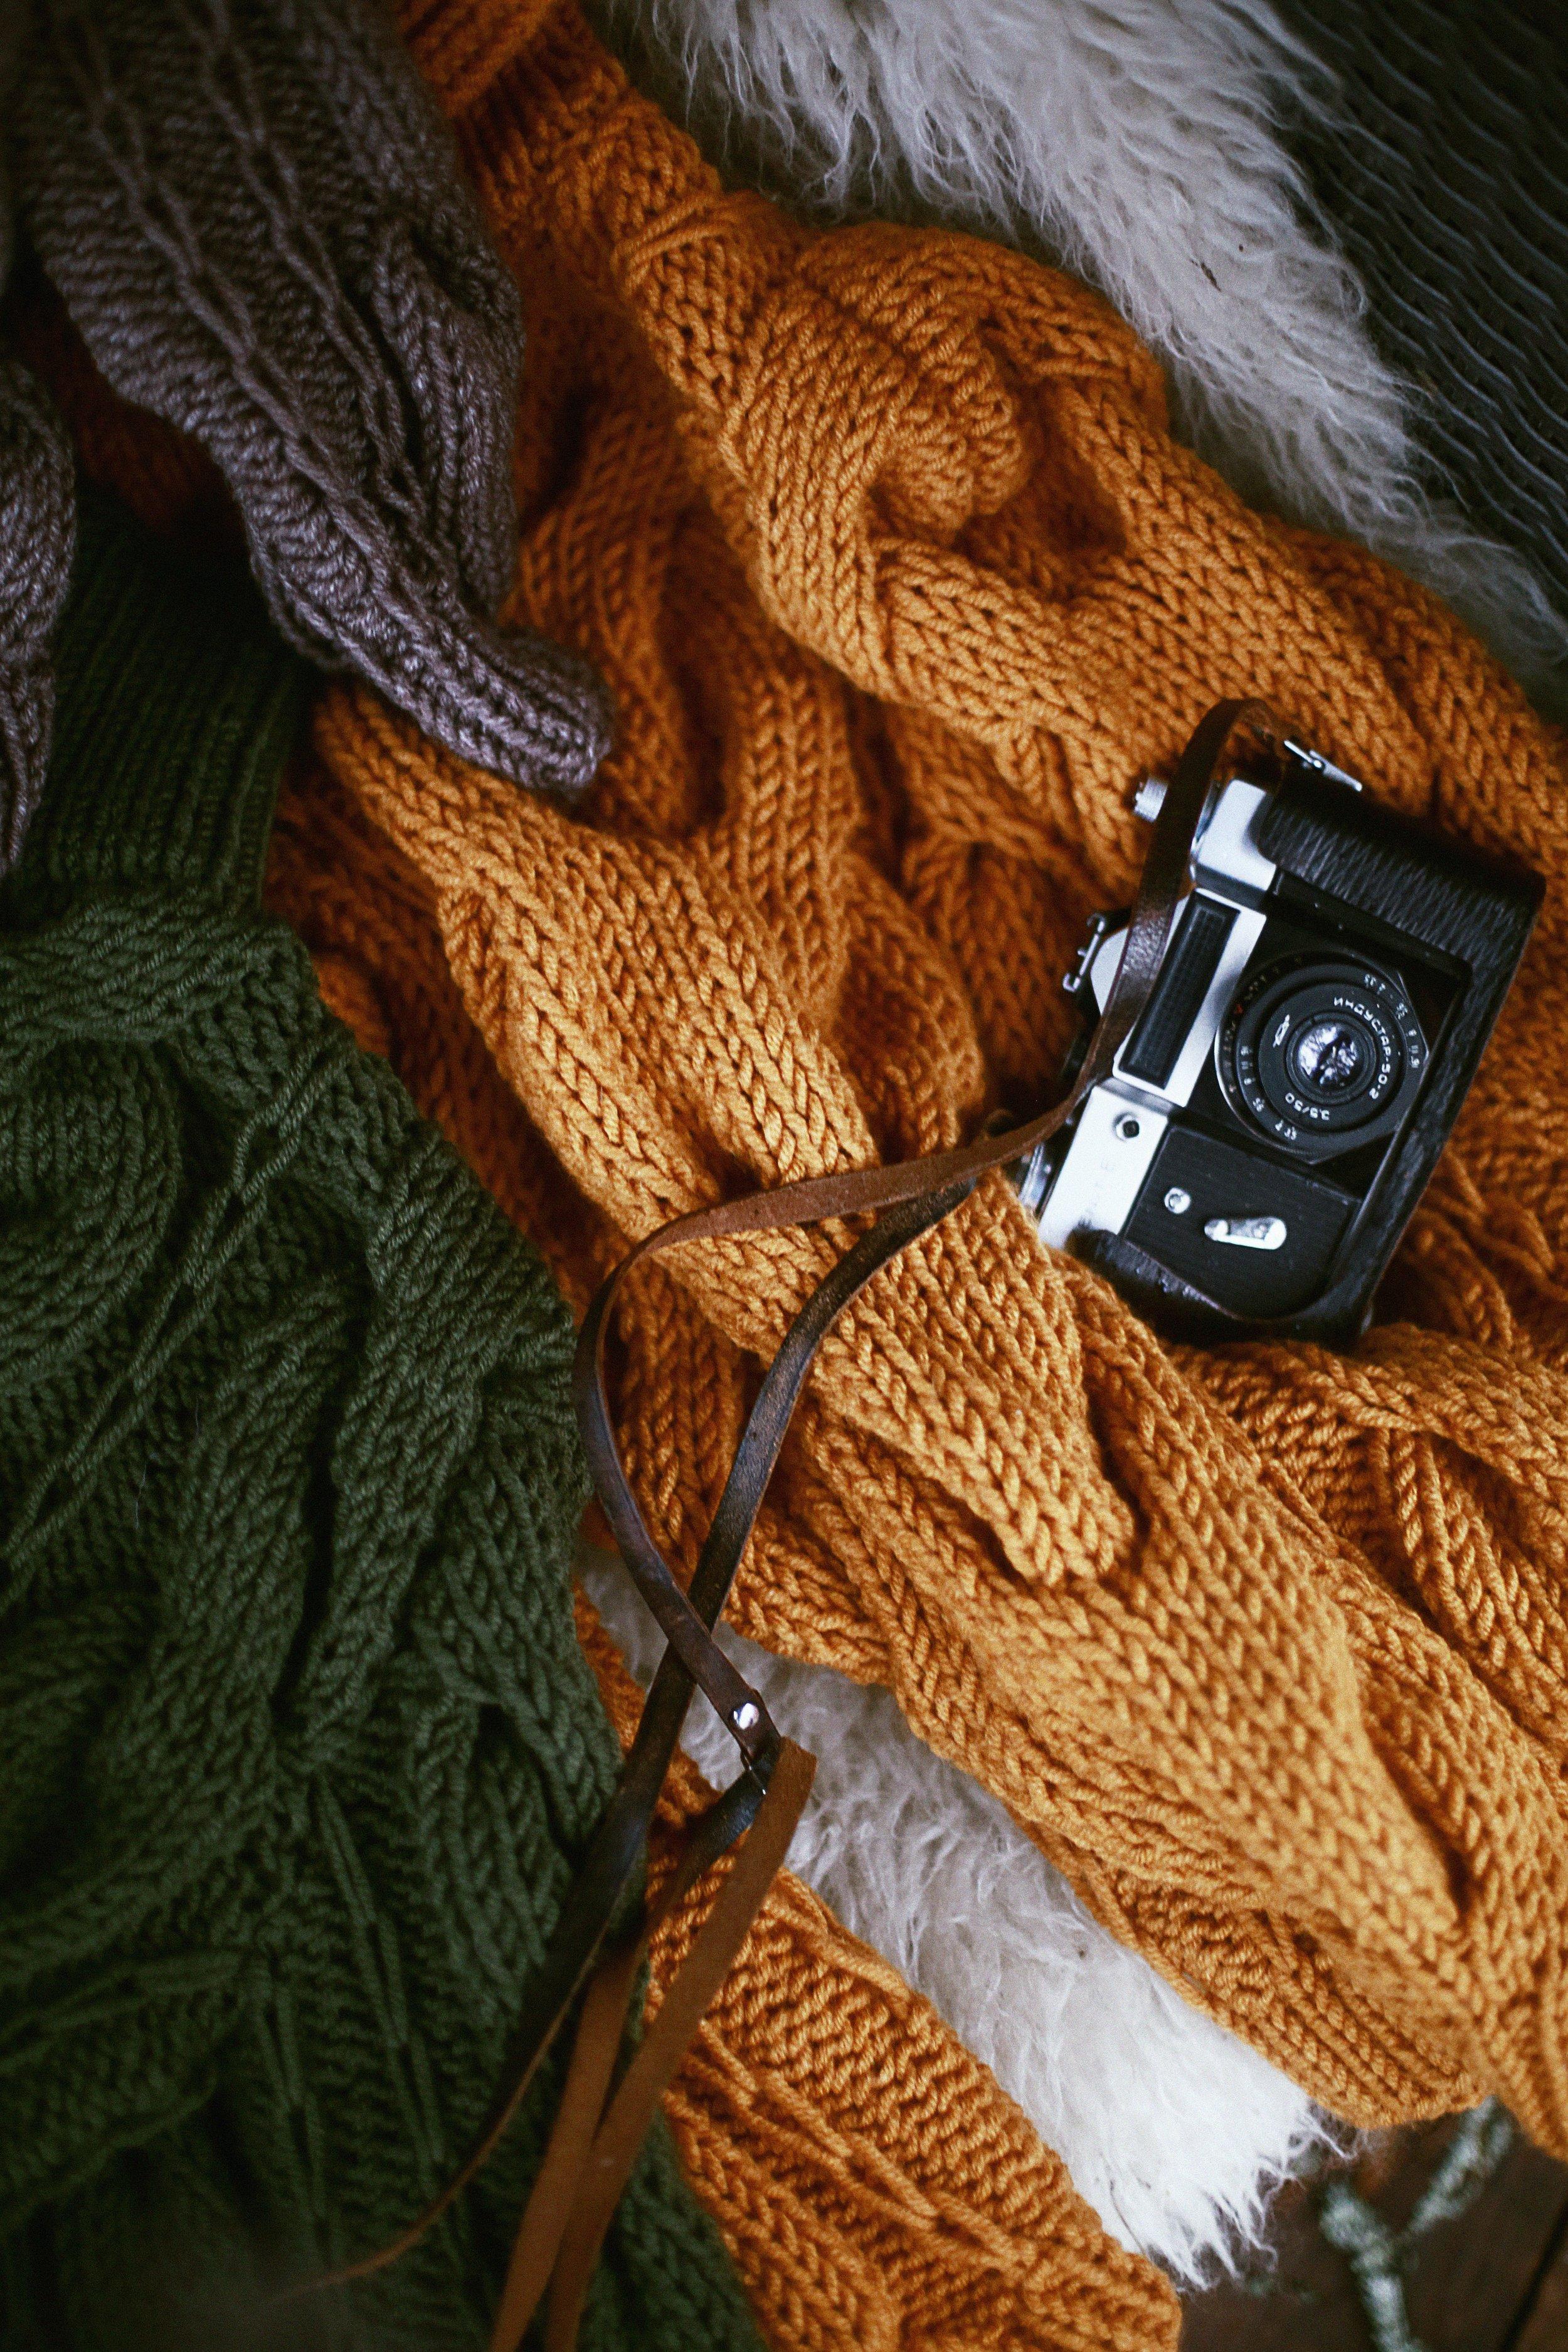 camera-knit-knitwear-879814.jpg